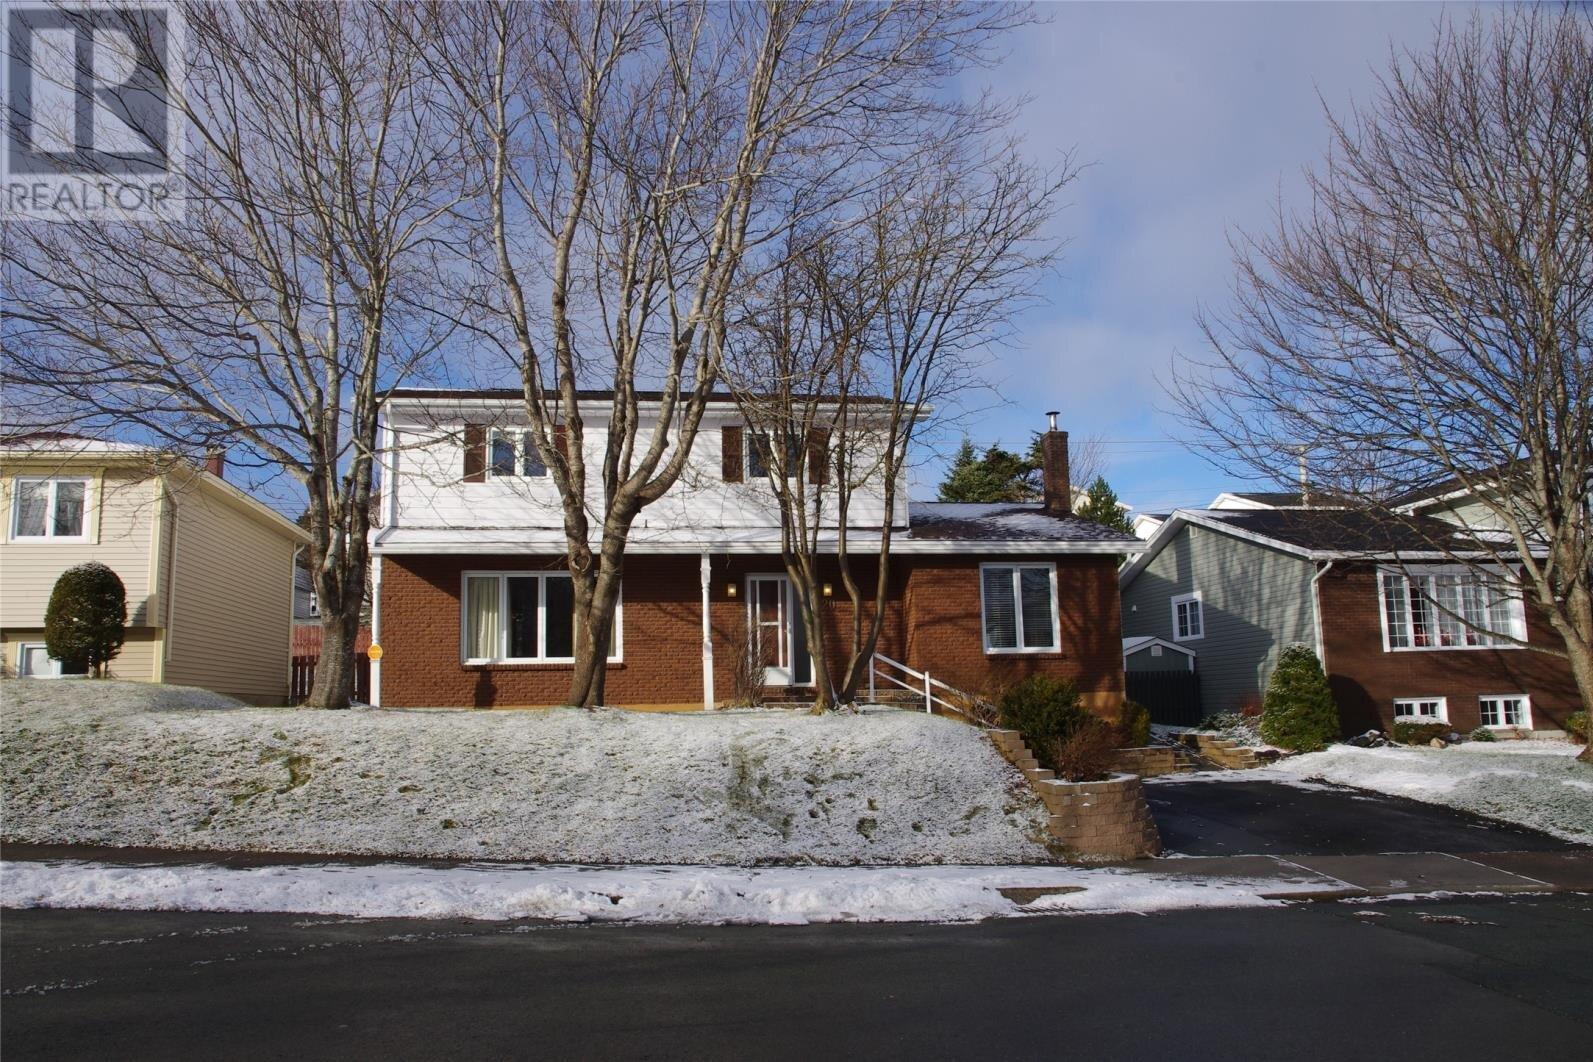 House for sale at 20 Calgary St St. John's Newfoundland - MLS: 1224234